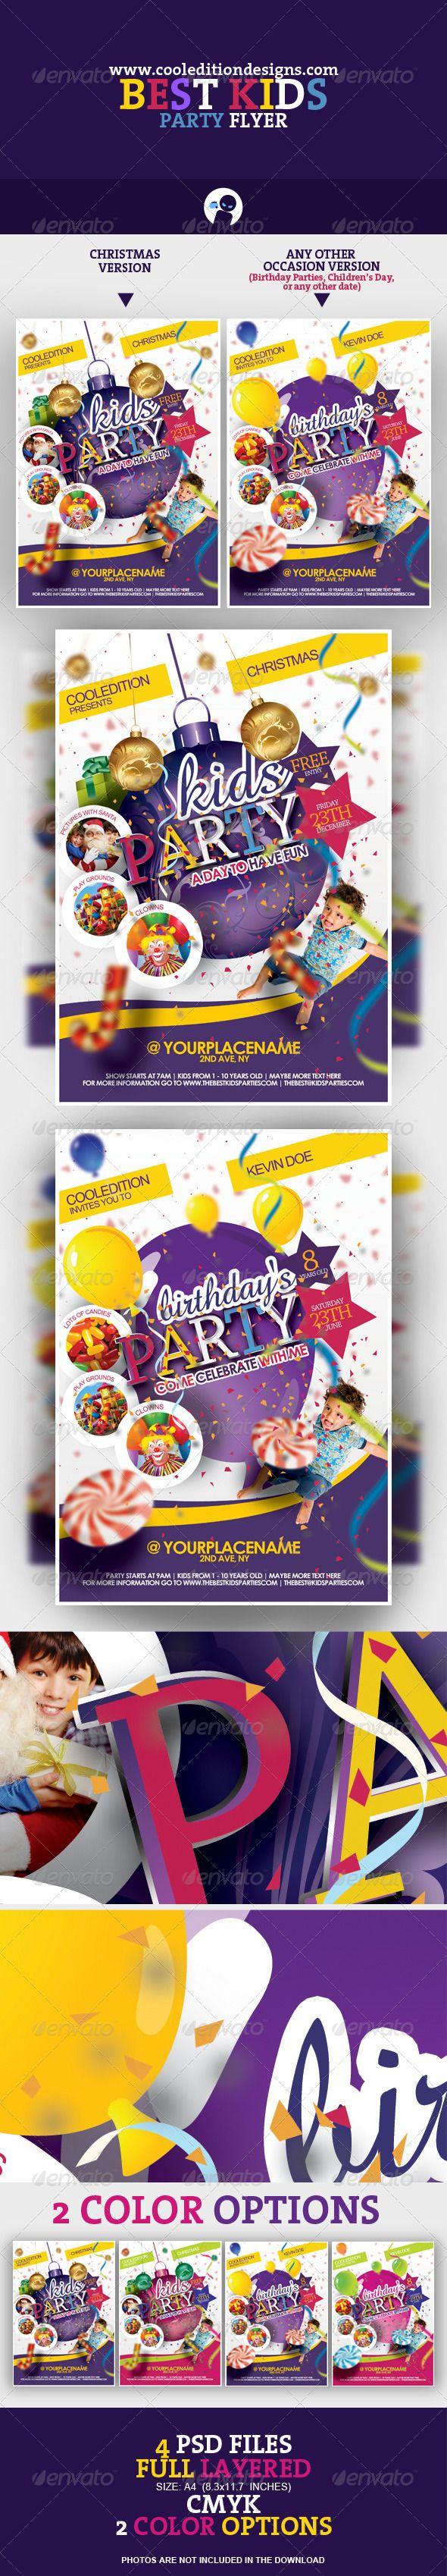 Best Kids Party Flyer  | $6